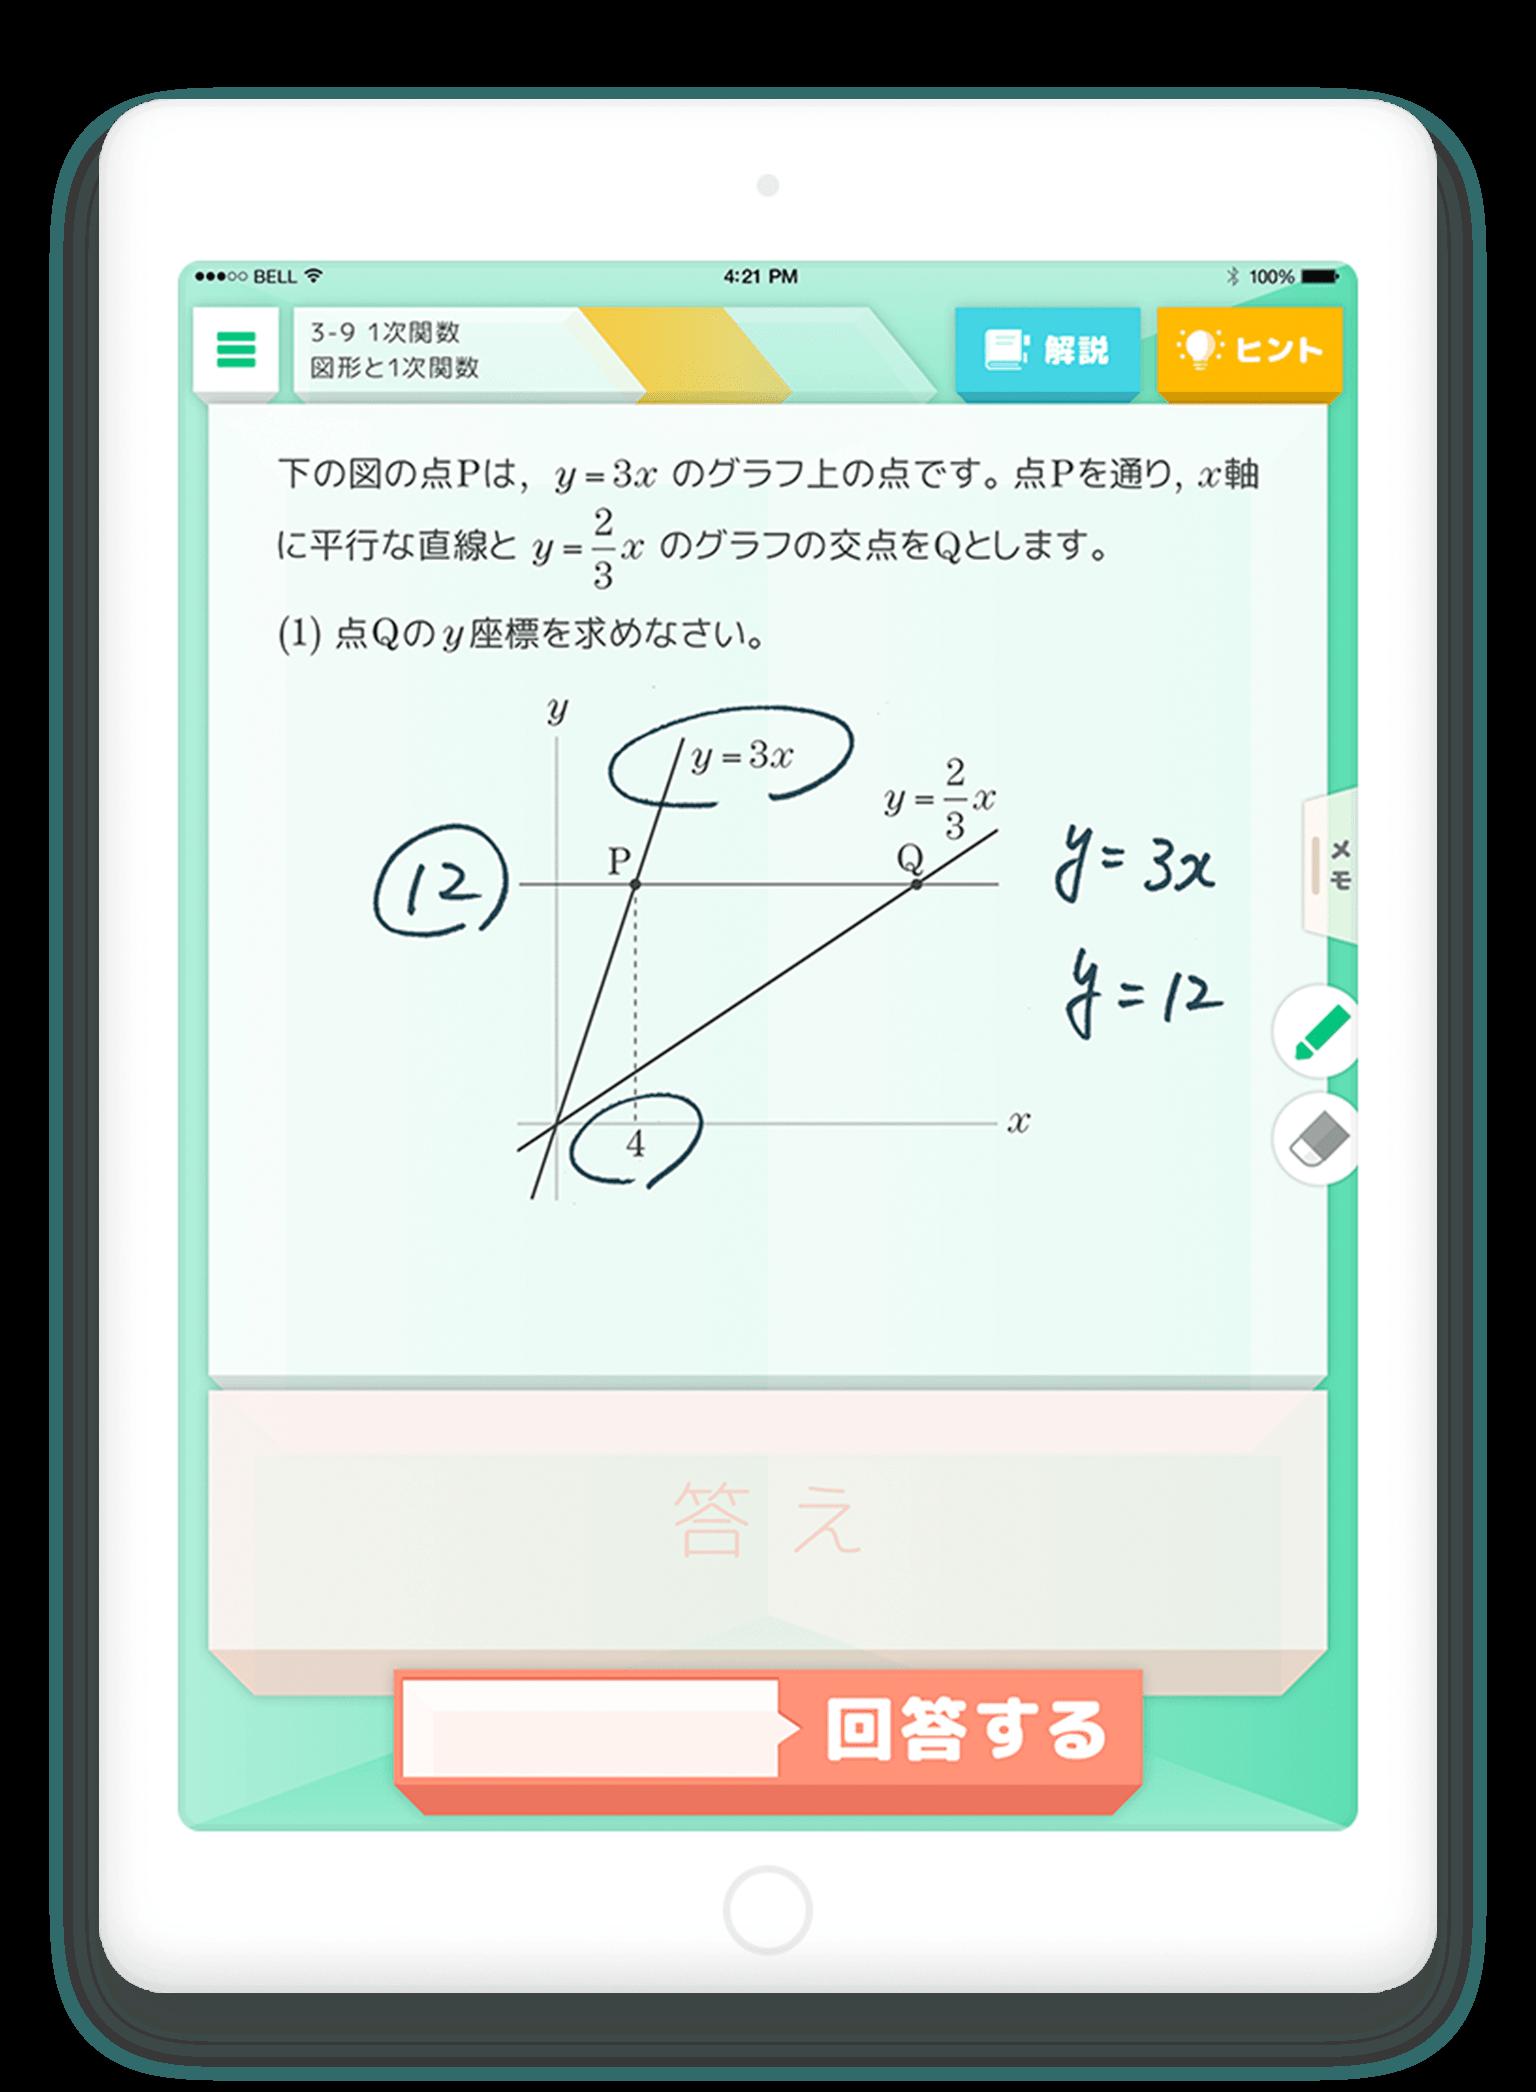 D24557-45-495661-1